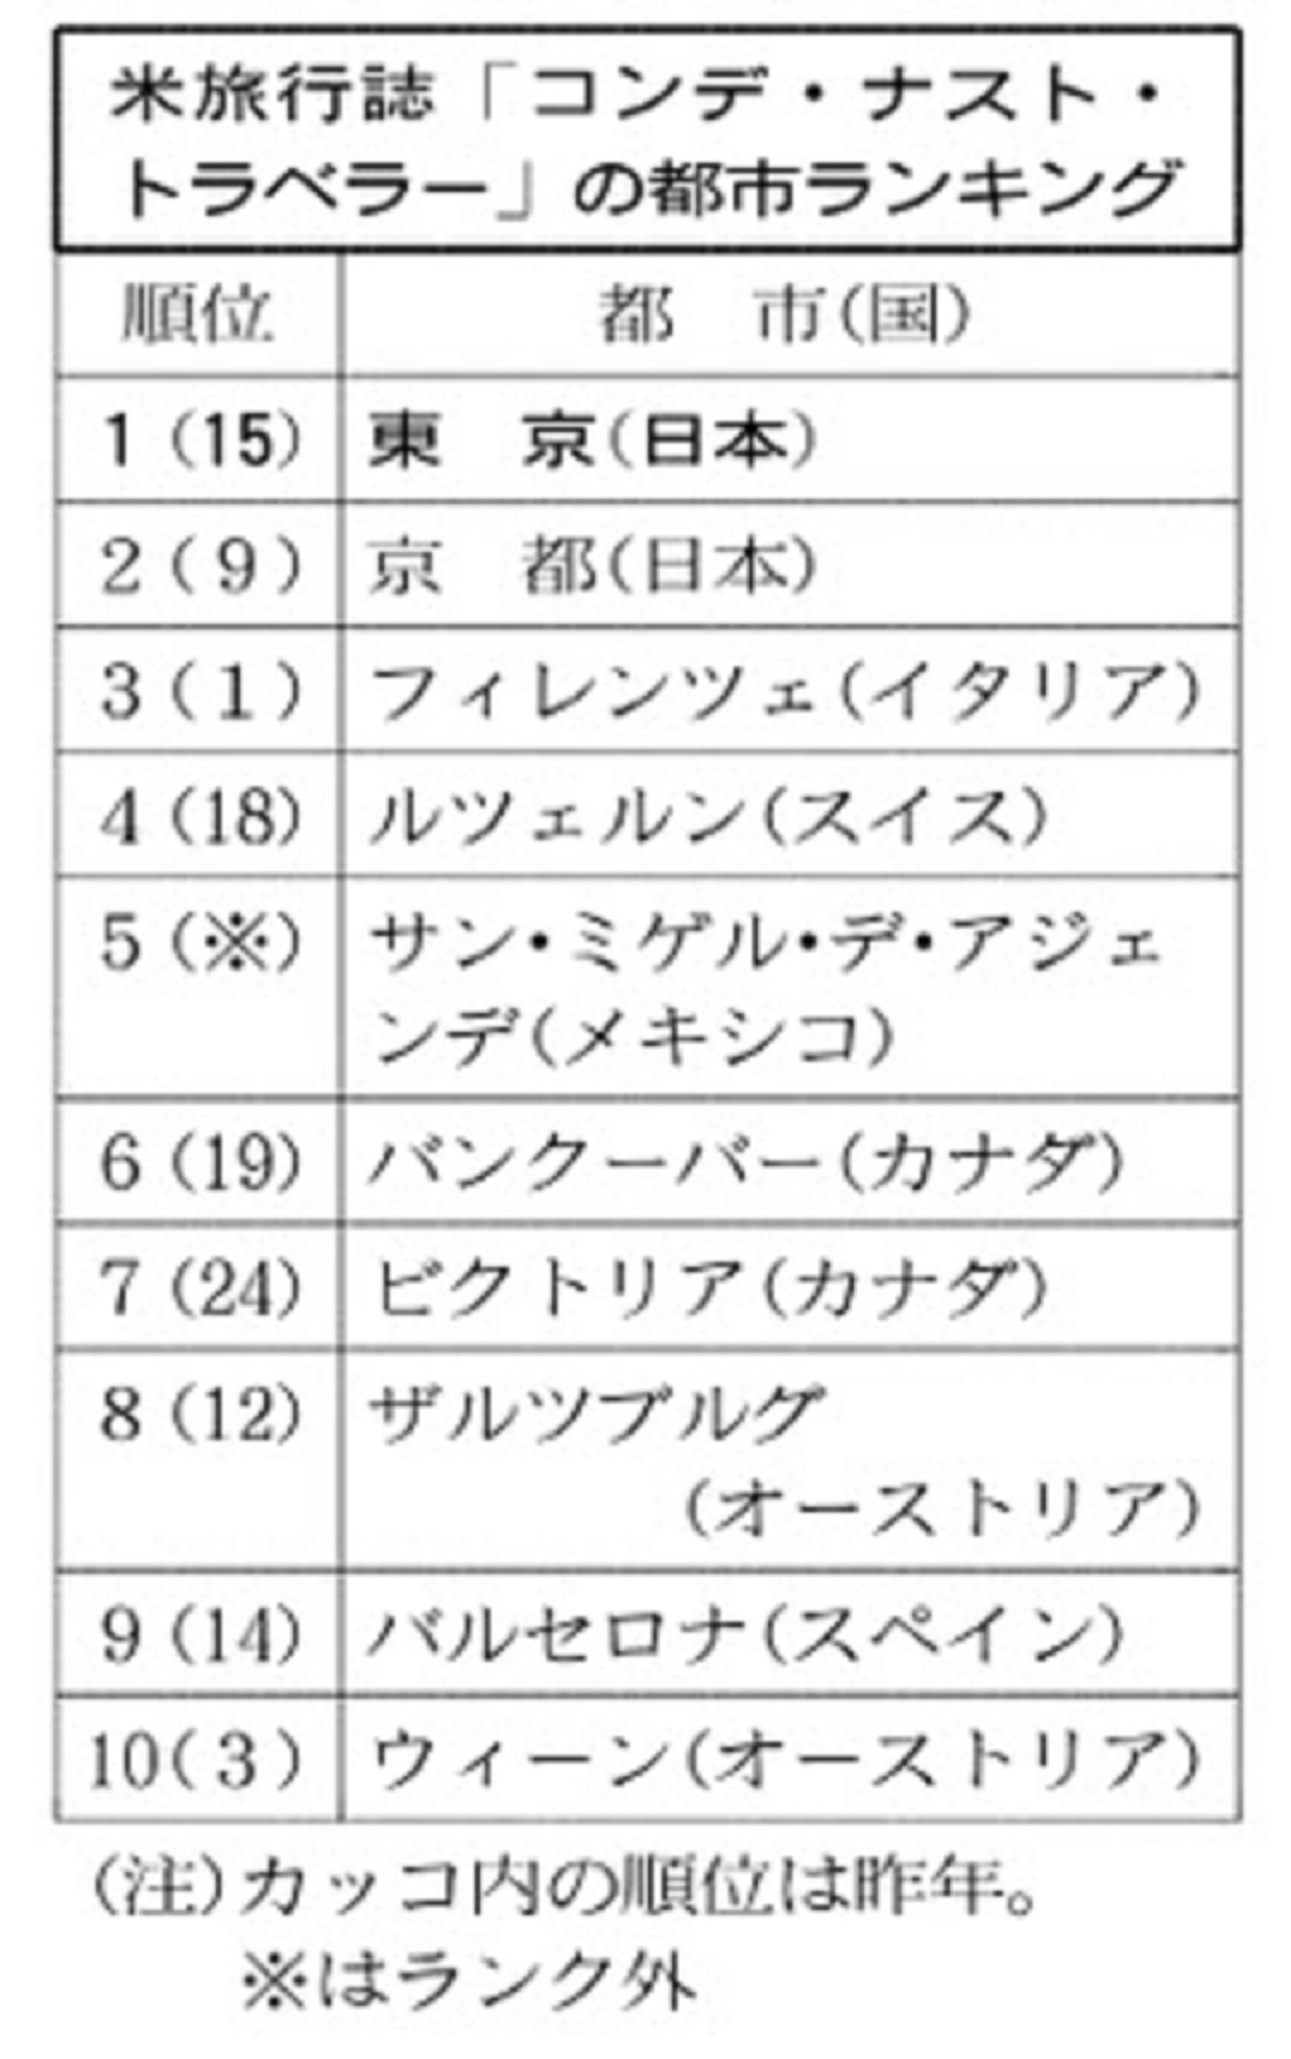 161020city-ranking2